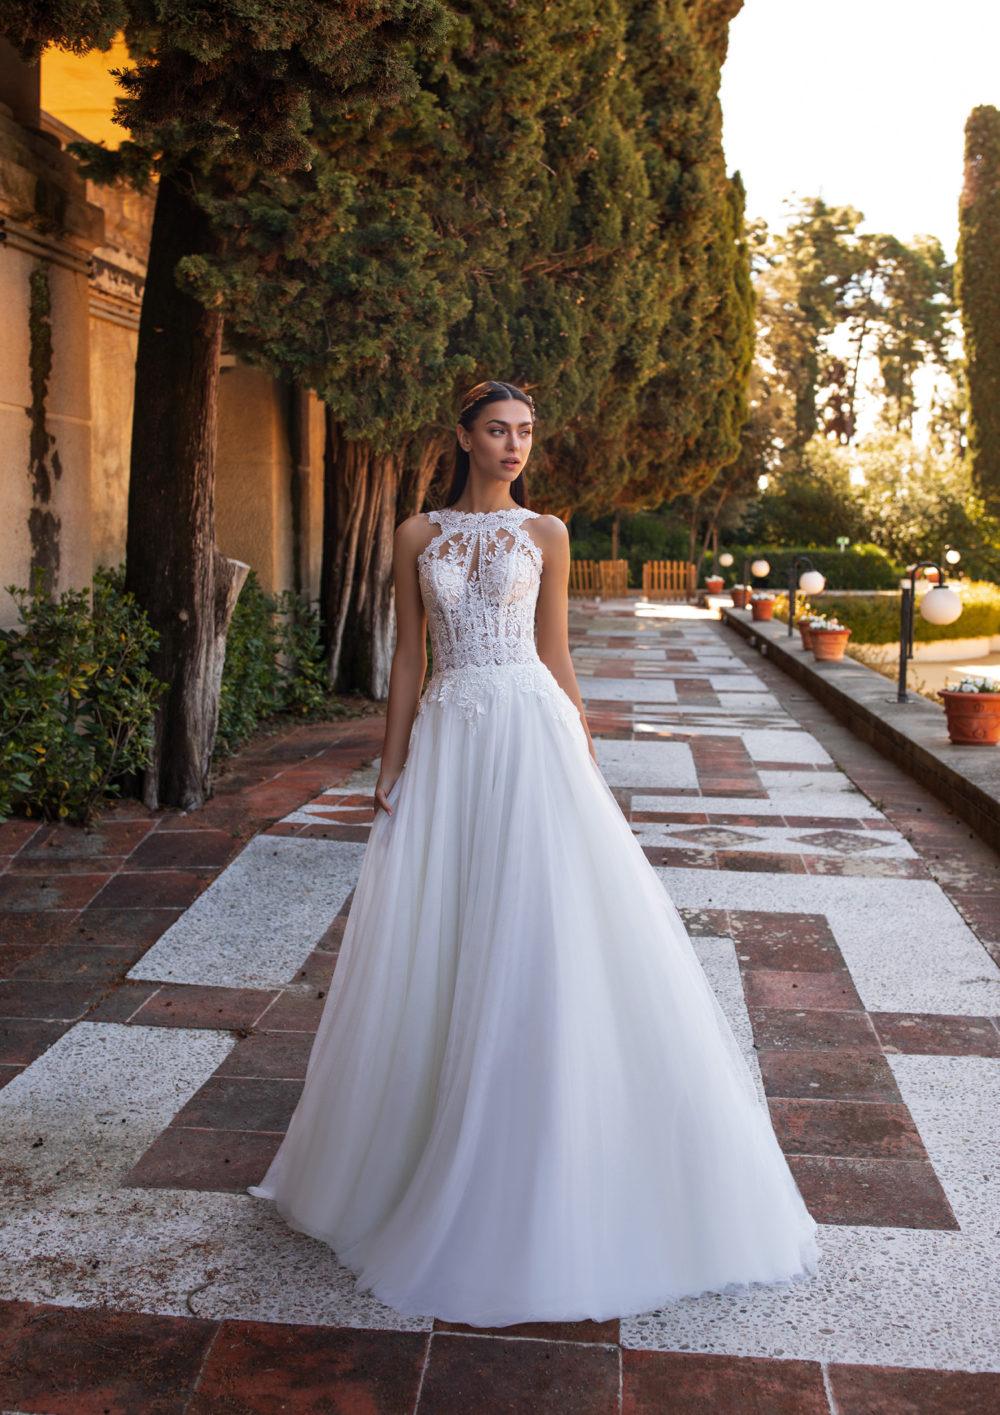 Mariages: abito da sposa Pronovias 2020 a Vicenza, Verona, Padova, Veneto HIMALIA